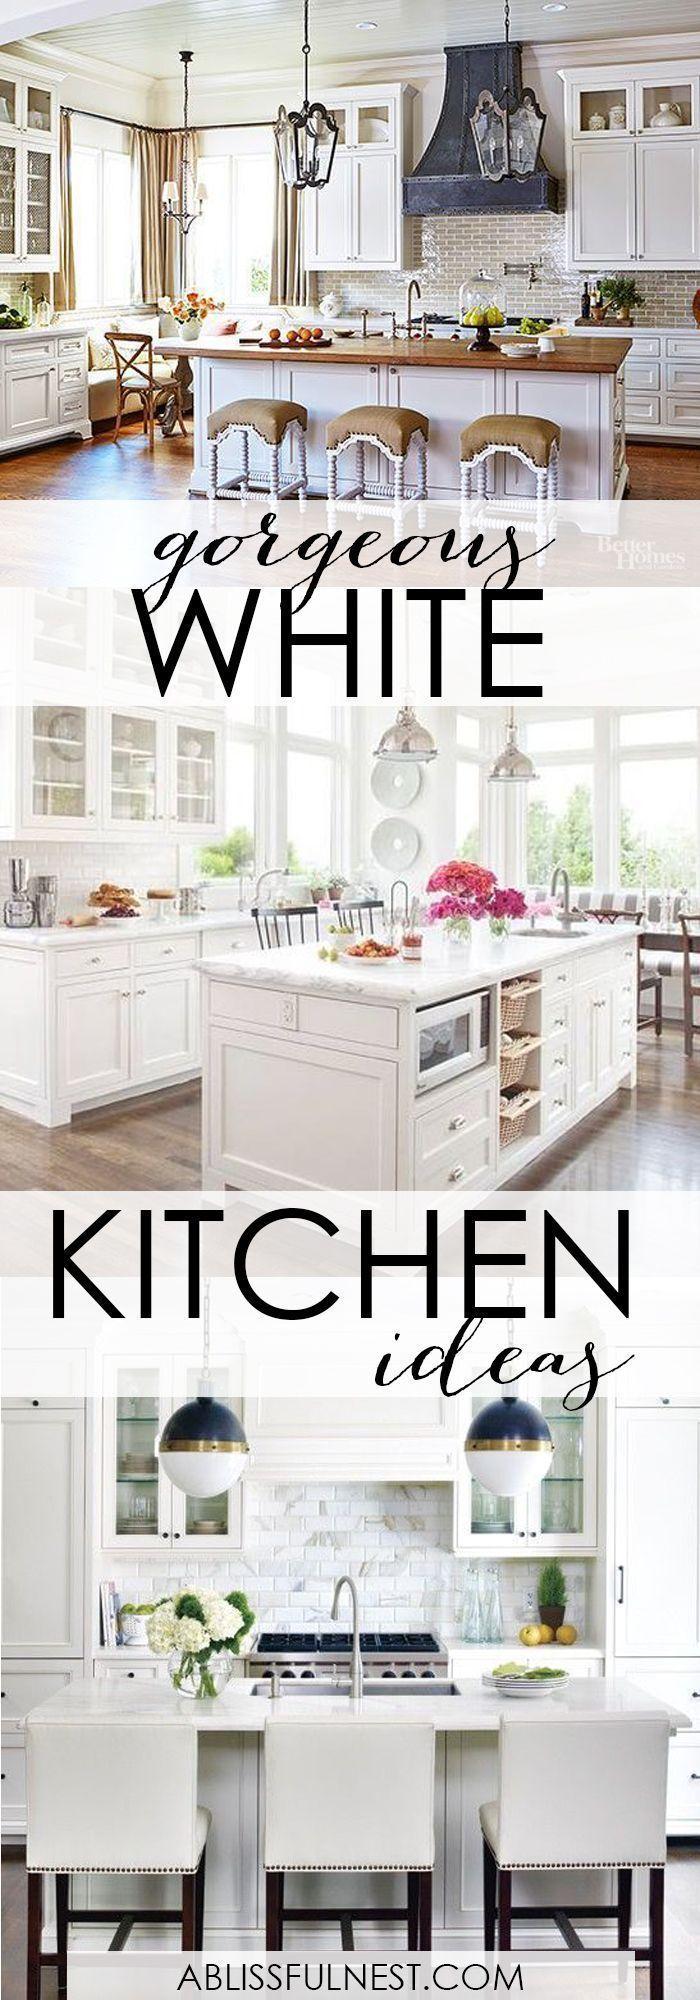 183 best Kitchen Design images on Pinterest | Dream kitchens ...